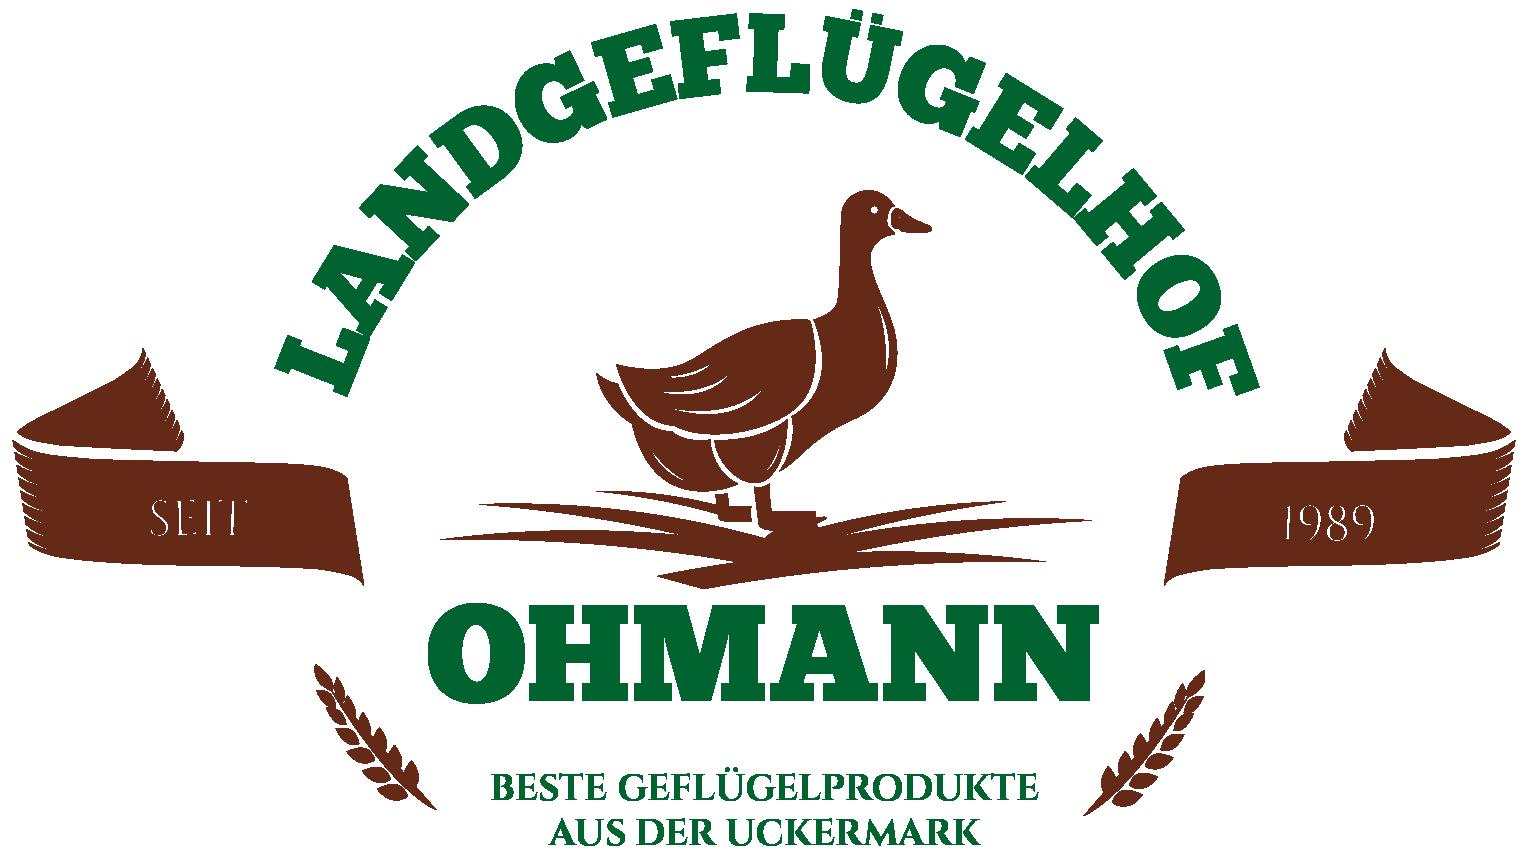 Landgeflügelhof Ohmann